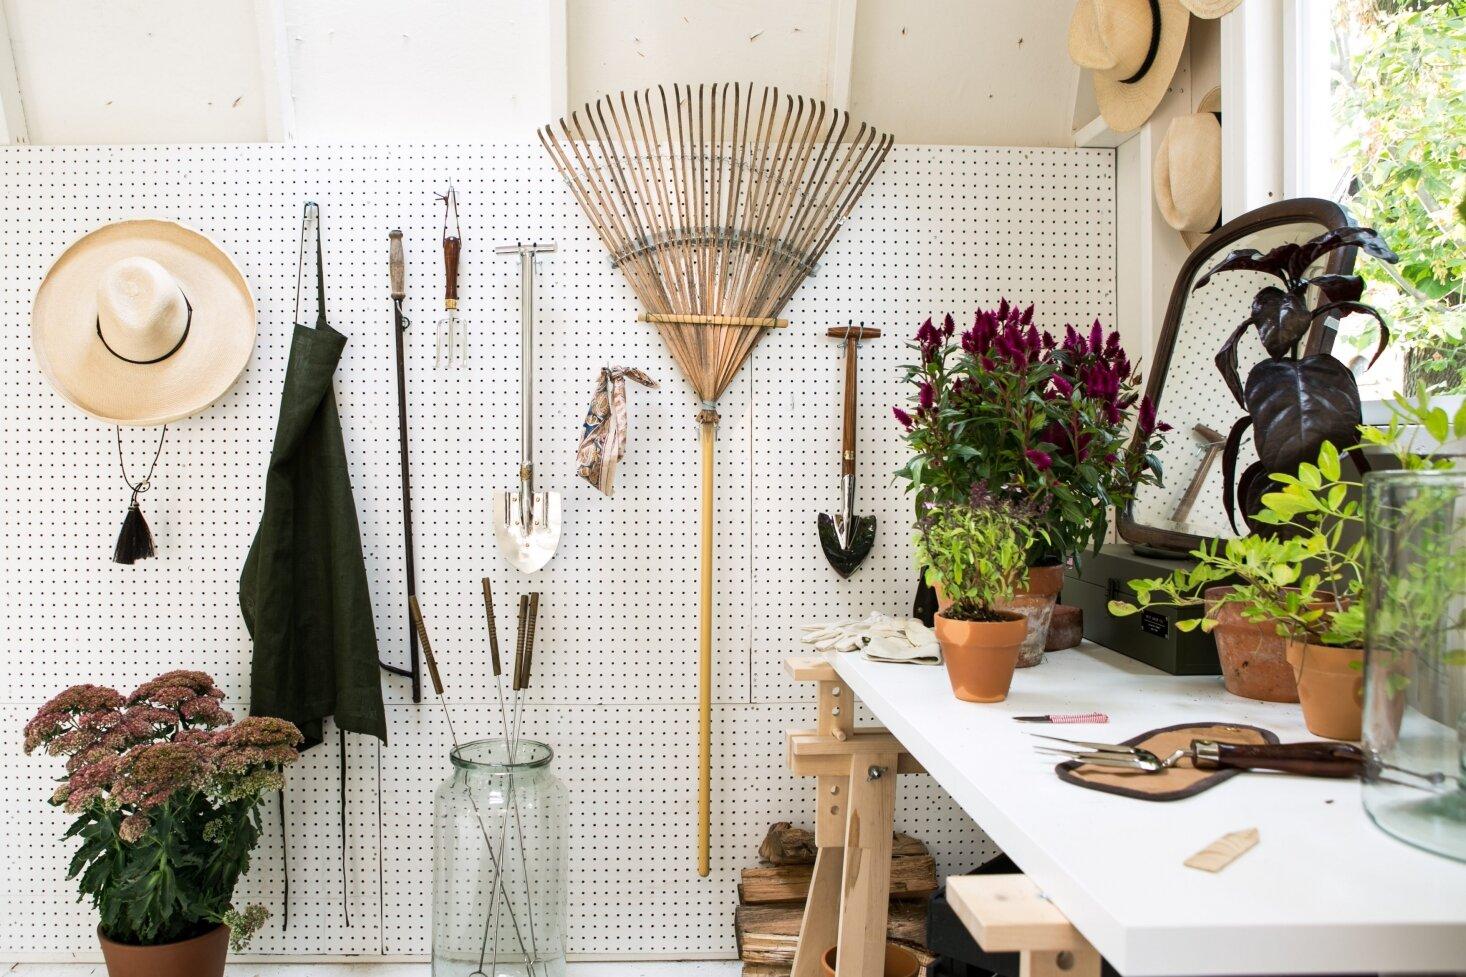 garden-shed-pegboard-storage-tools-michelle-adams-ann-arbor-by-marta-xochilt-perez-1466x977.jpg